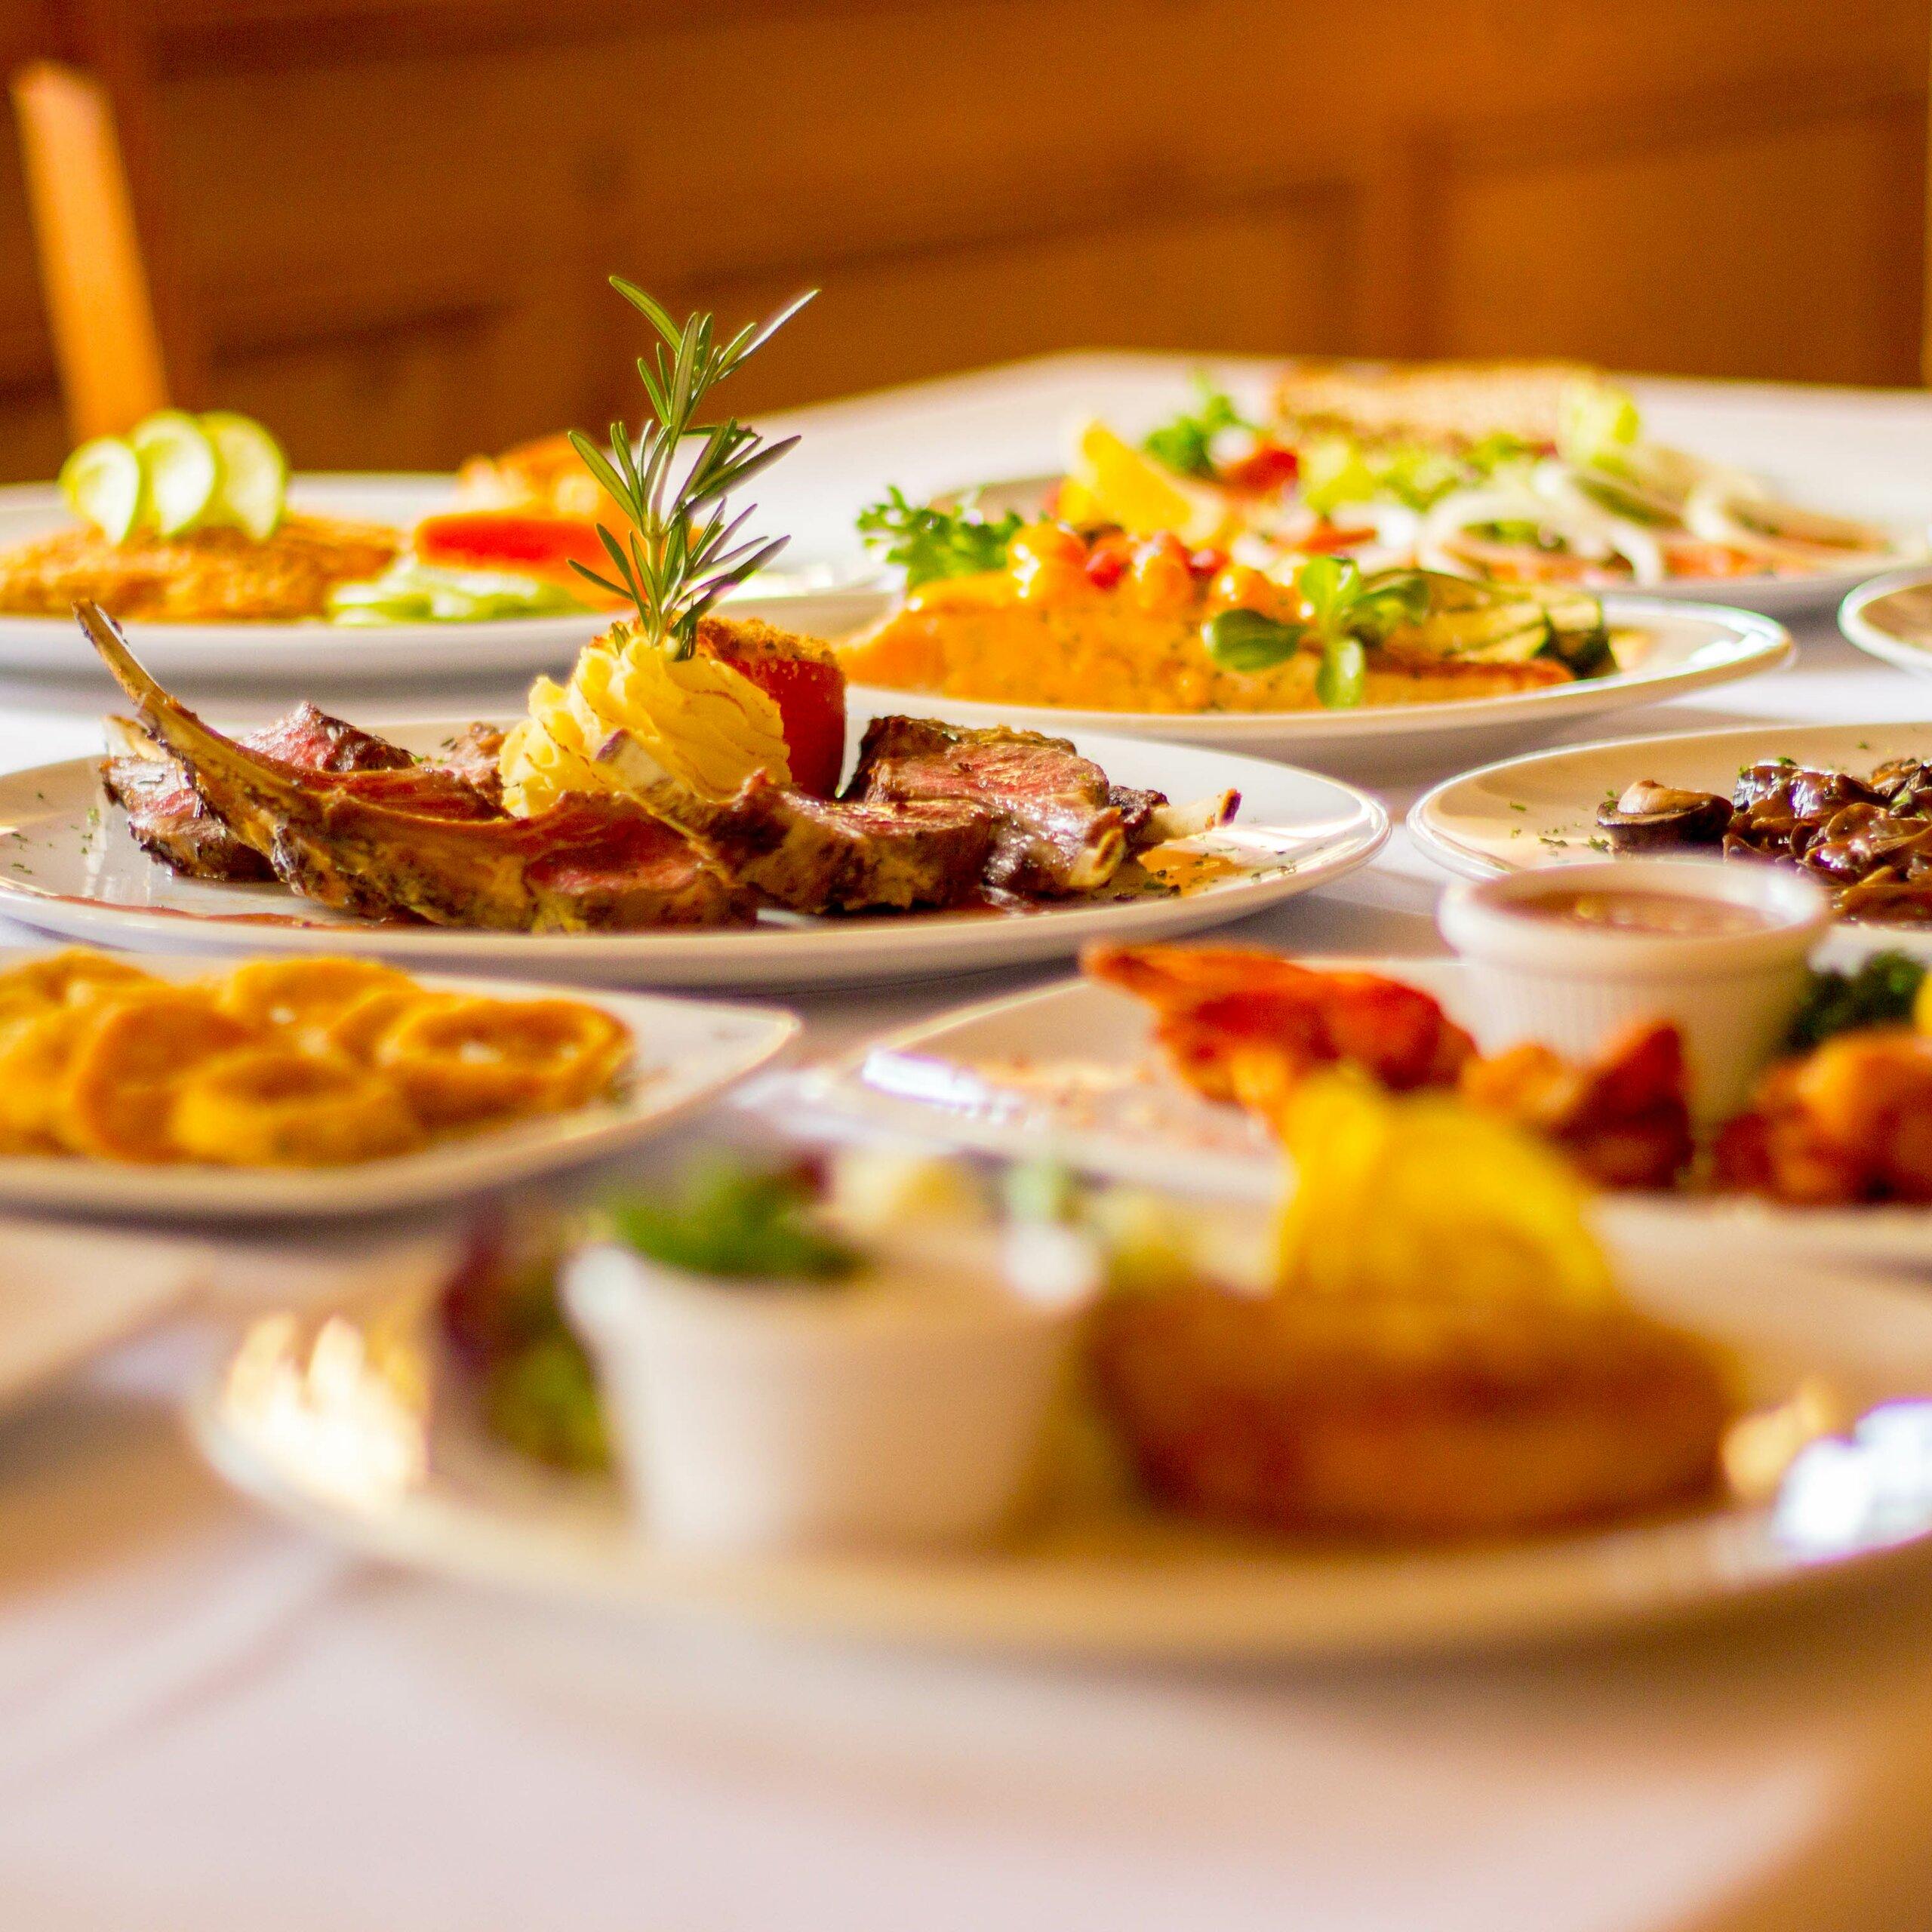 Chalet Suisse Aruba - Fine Dining Steakhouse & Seafood